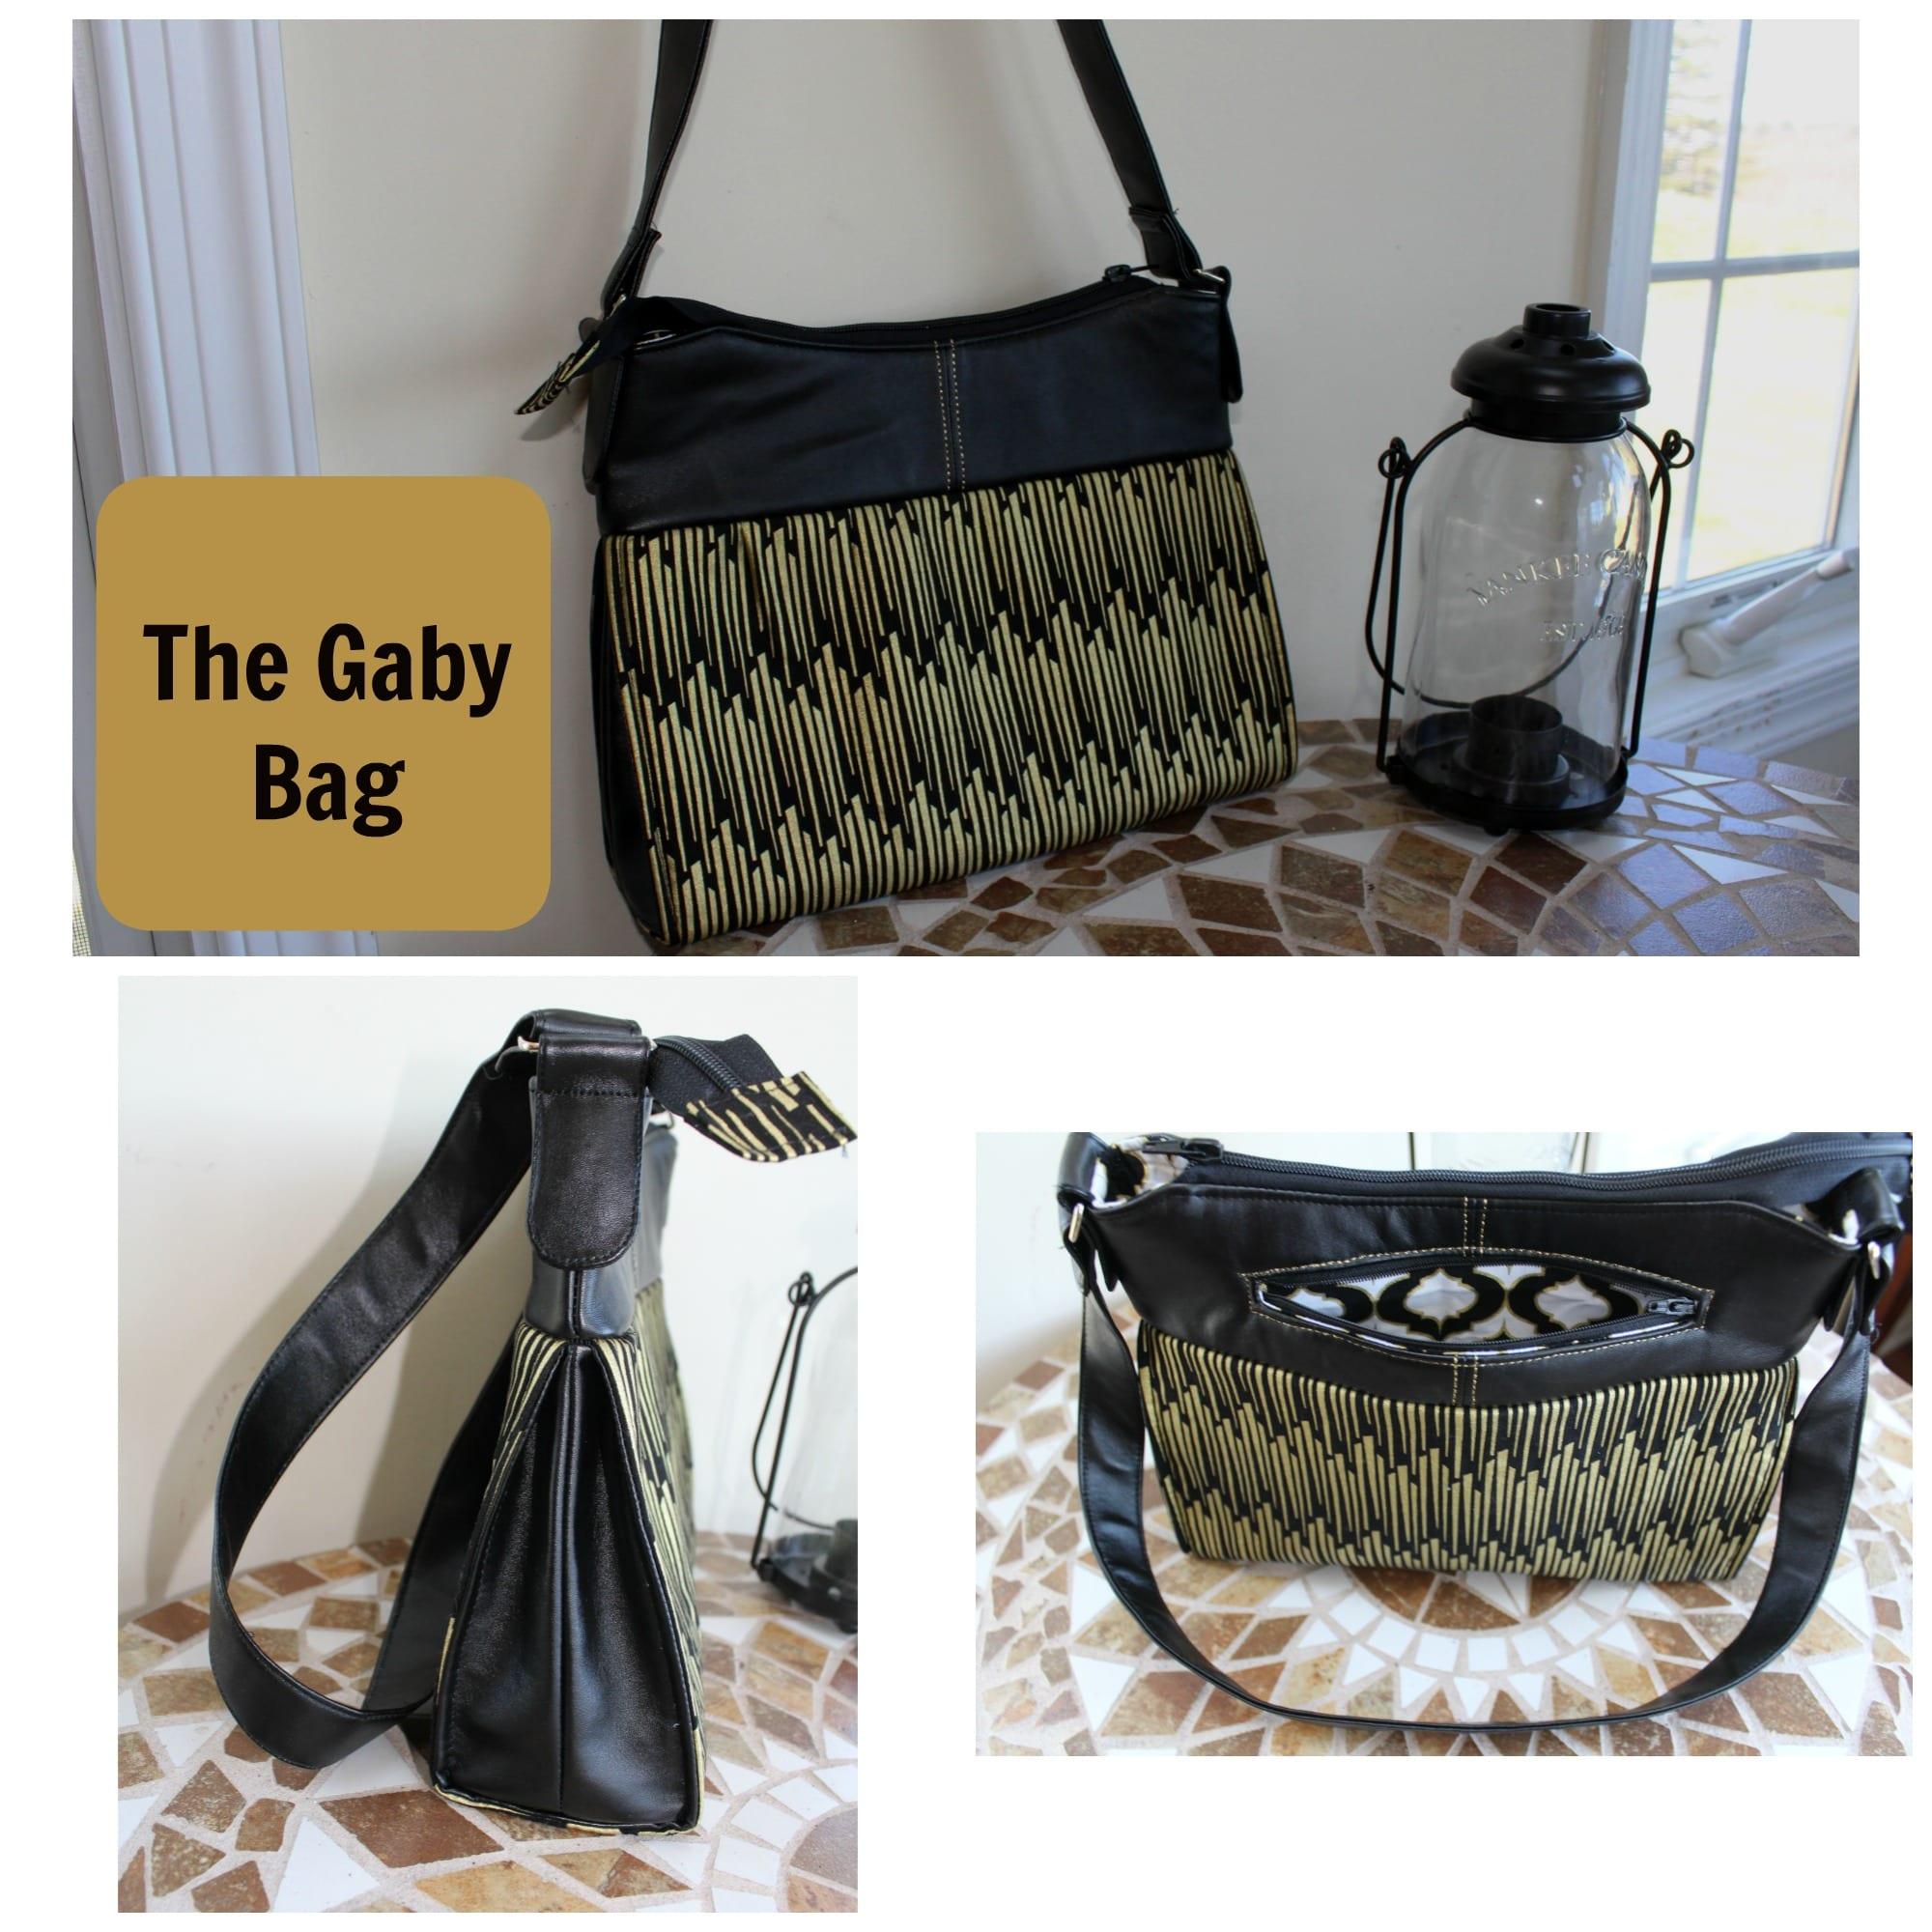 The Gabby Bag